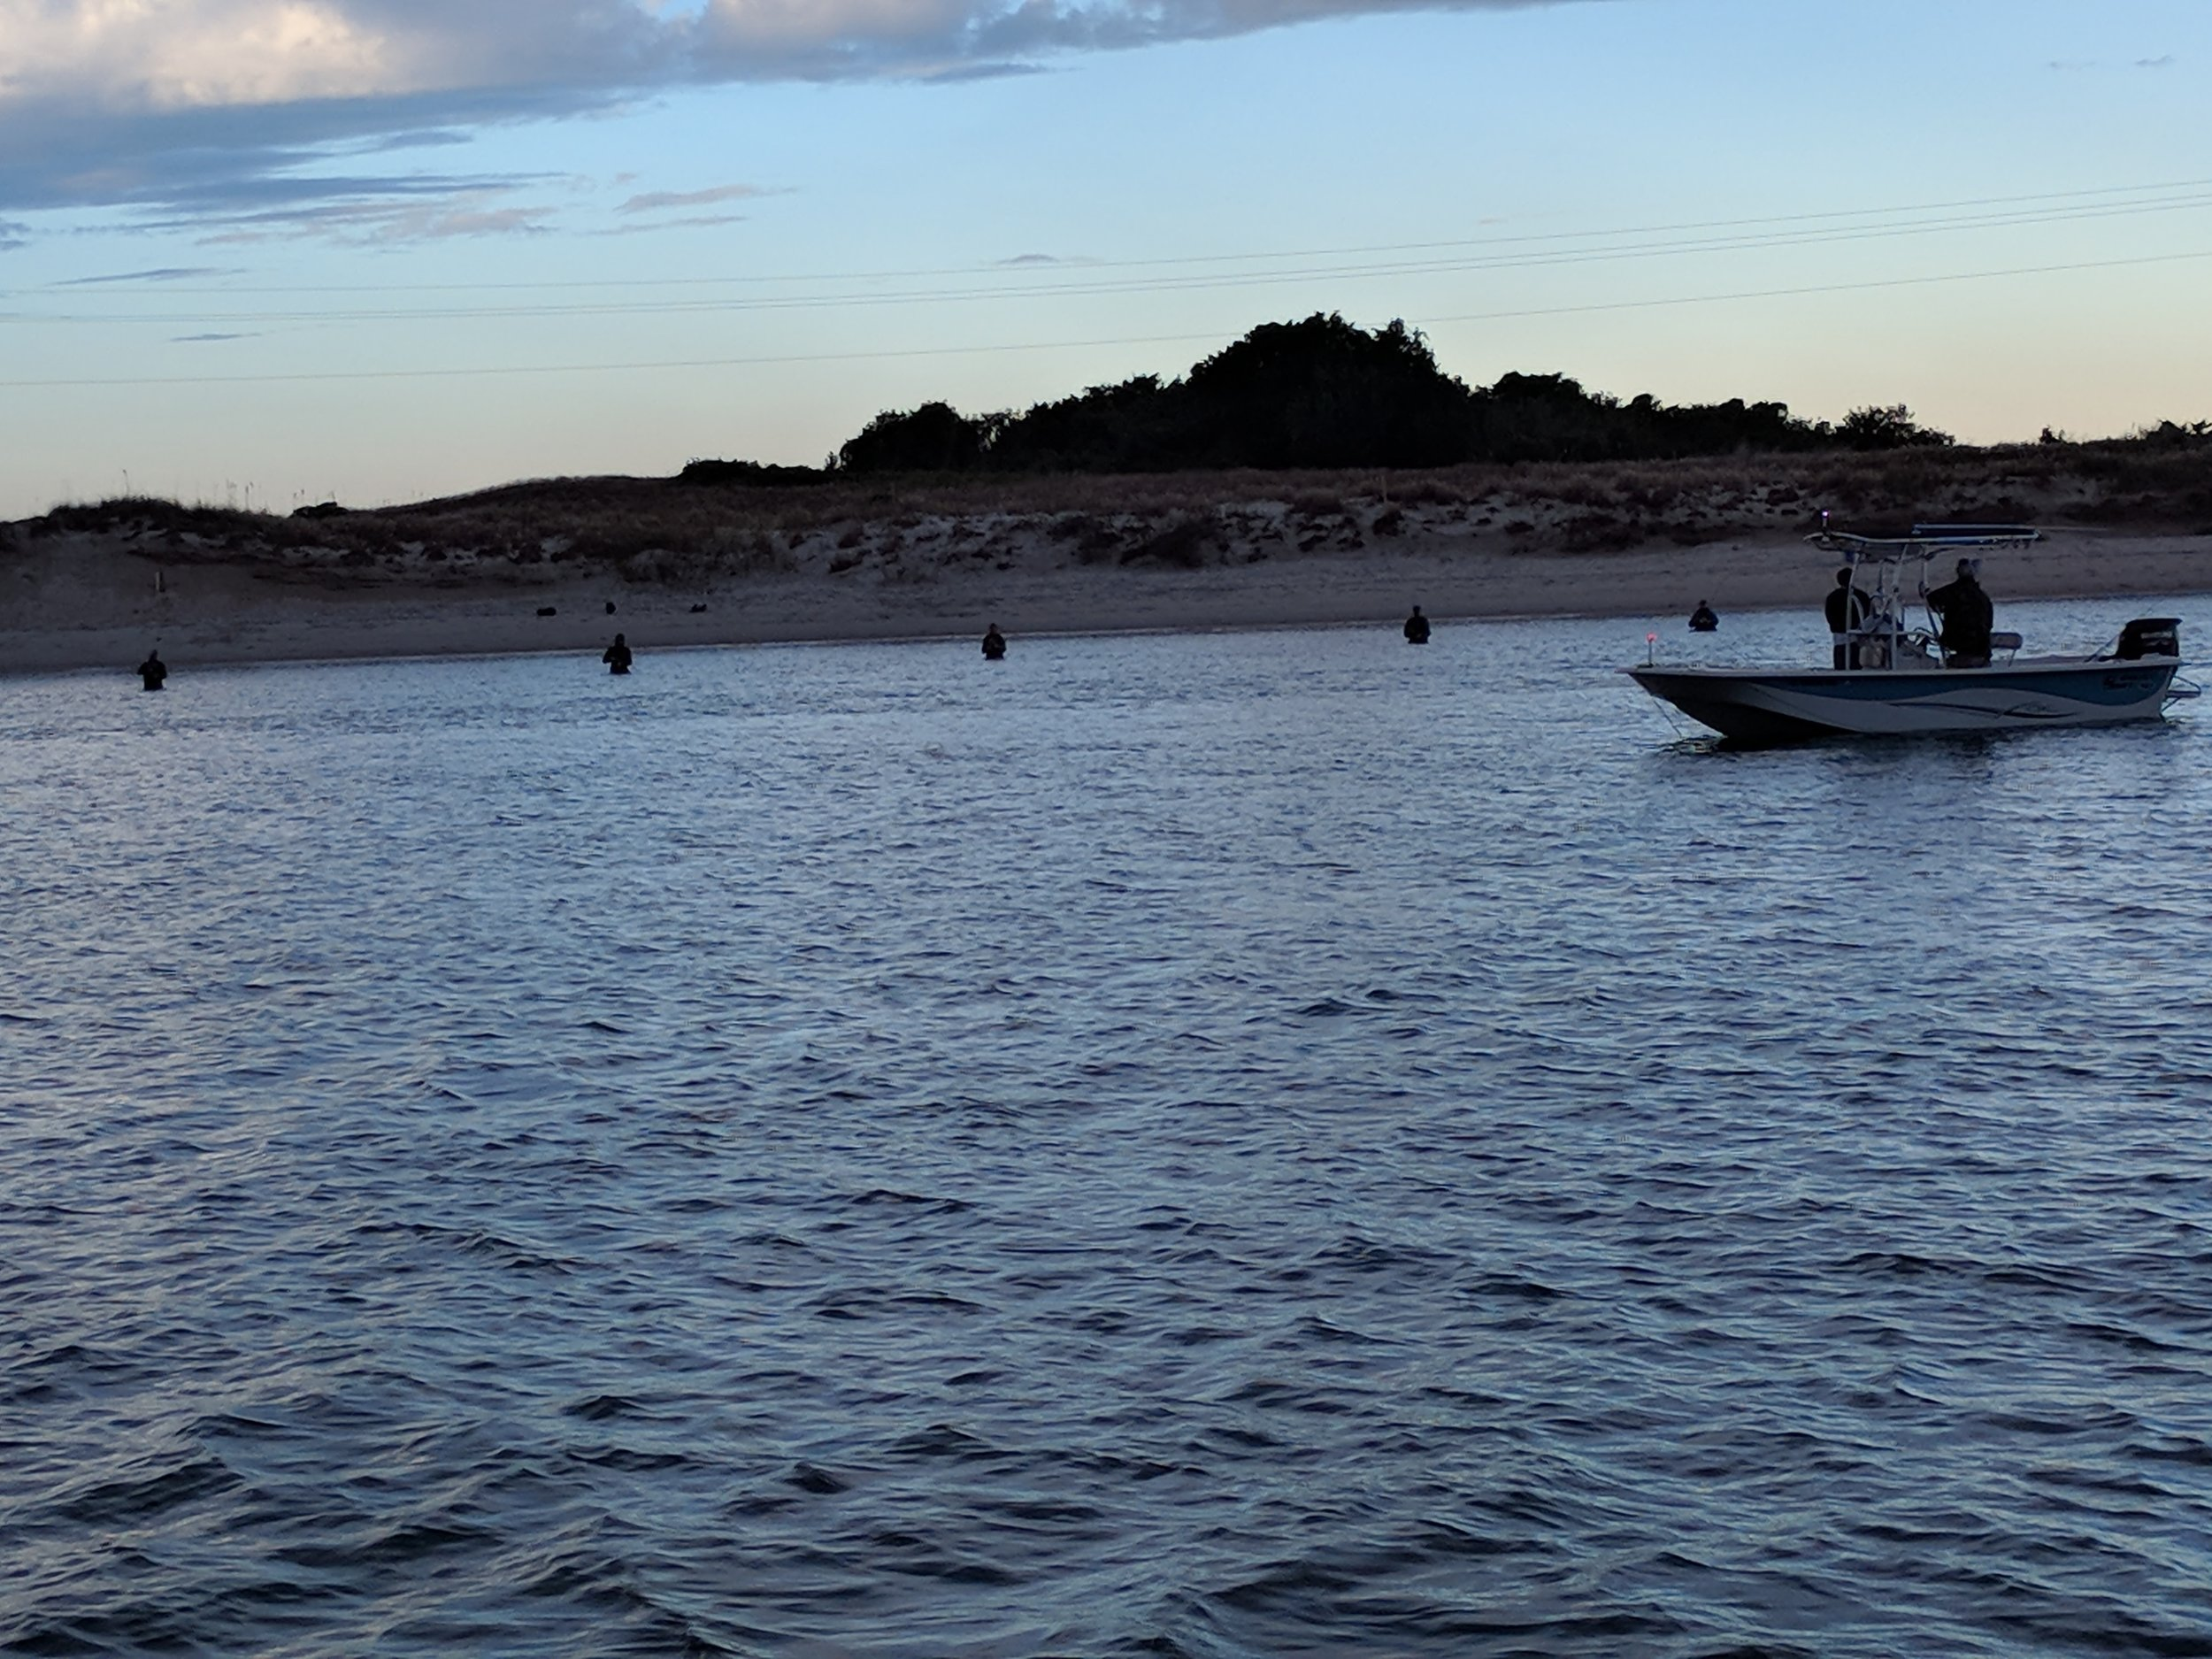 5 fisherman waist high in water.